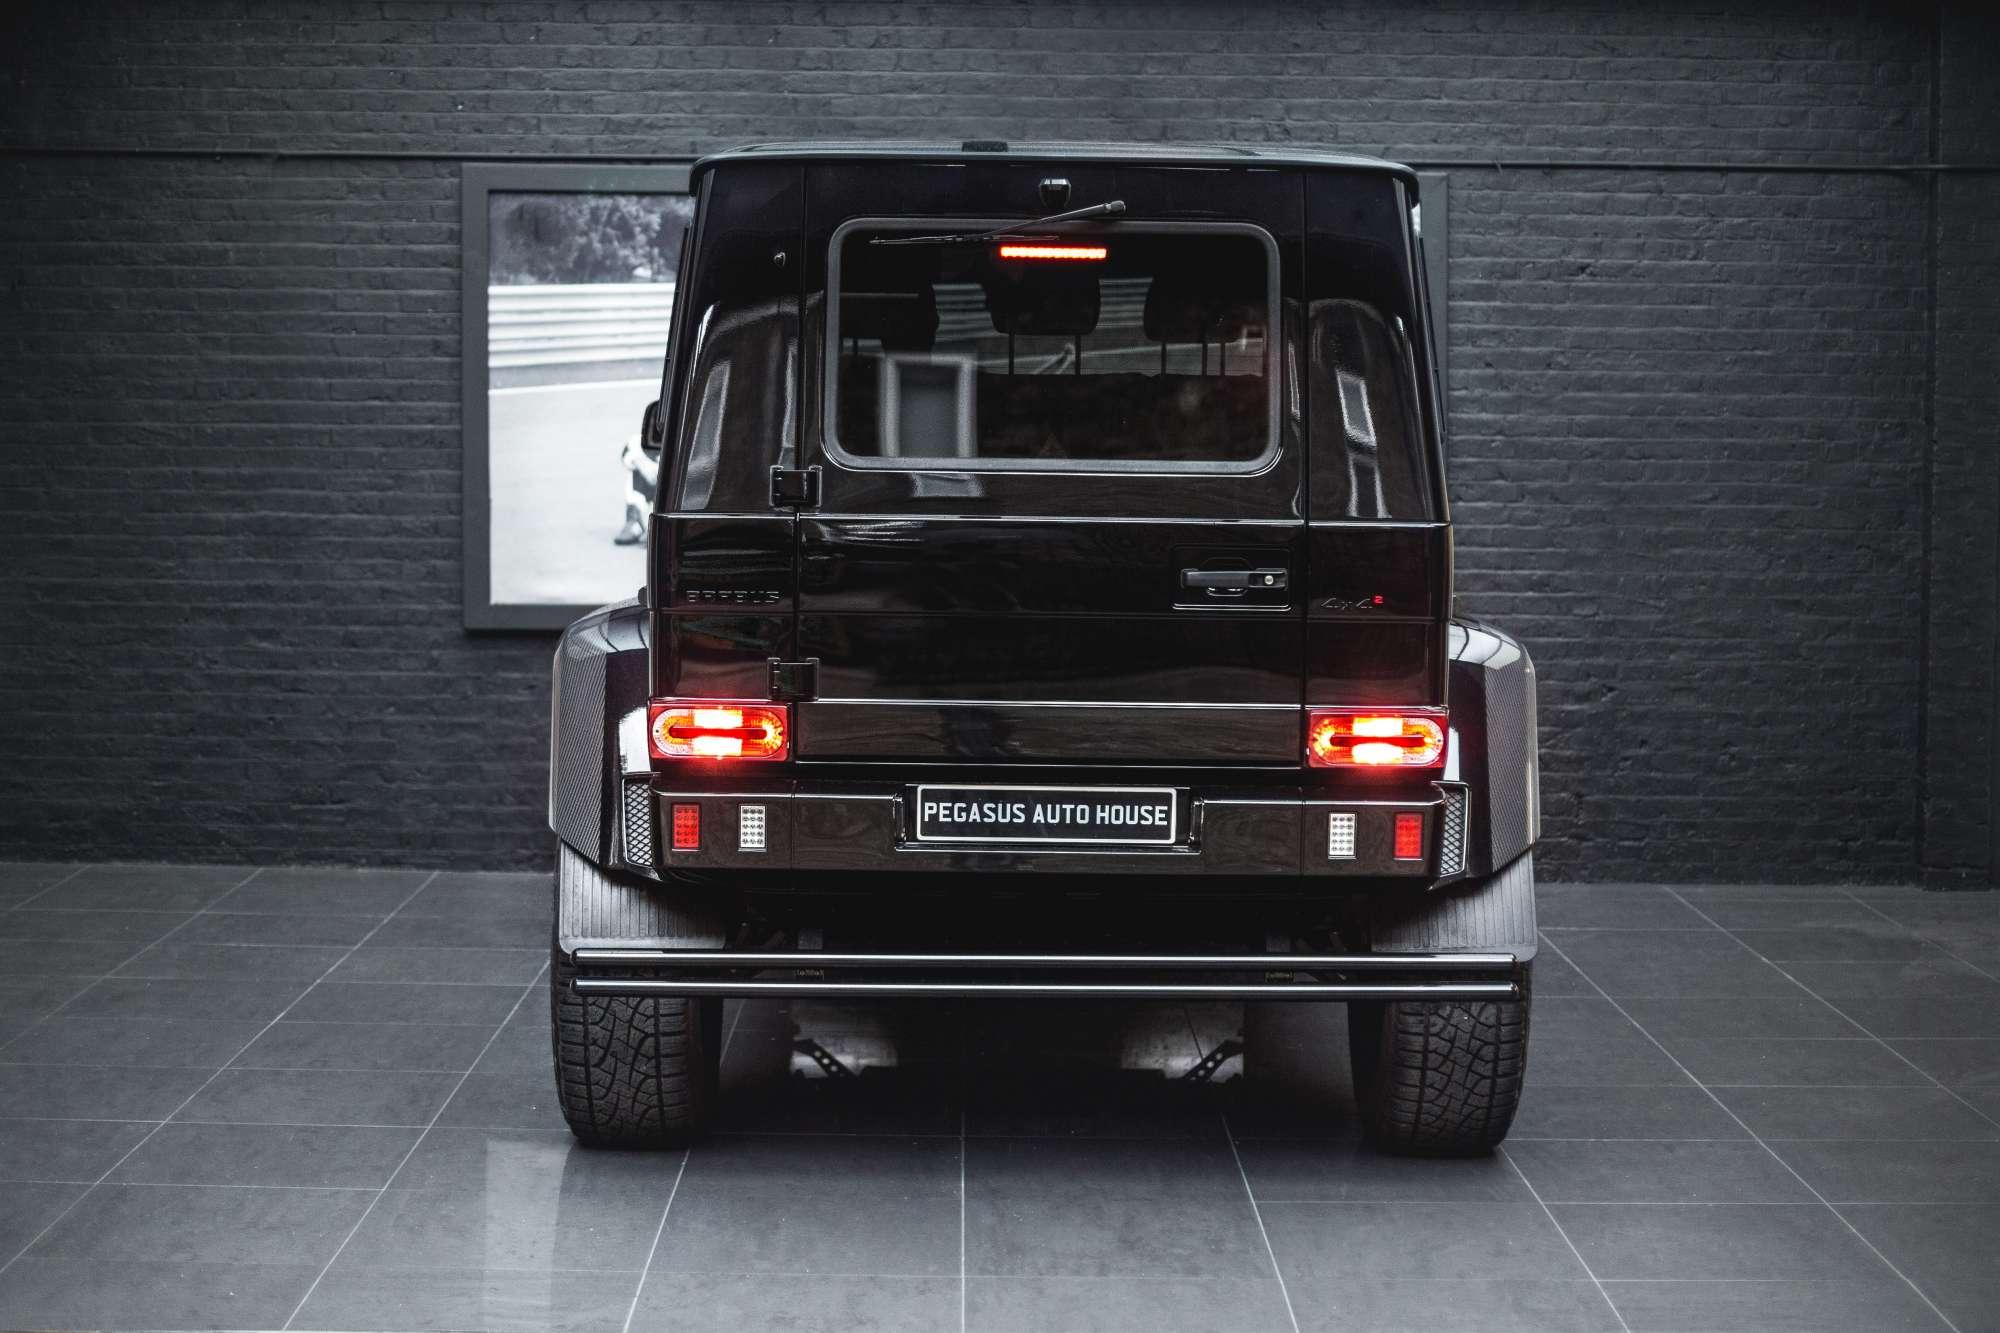 Lhd Mercedes Benz G500 4x4 Brabus Pegasus Auto House